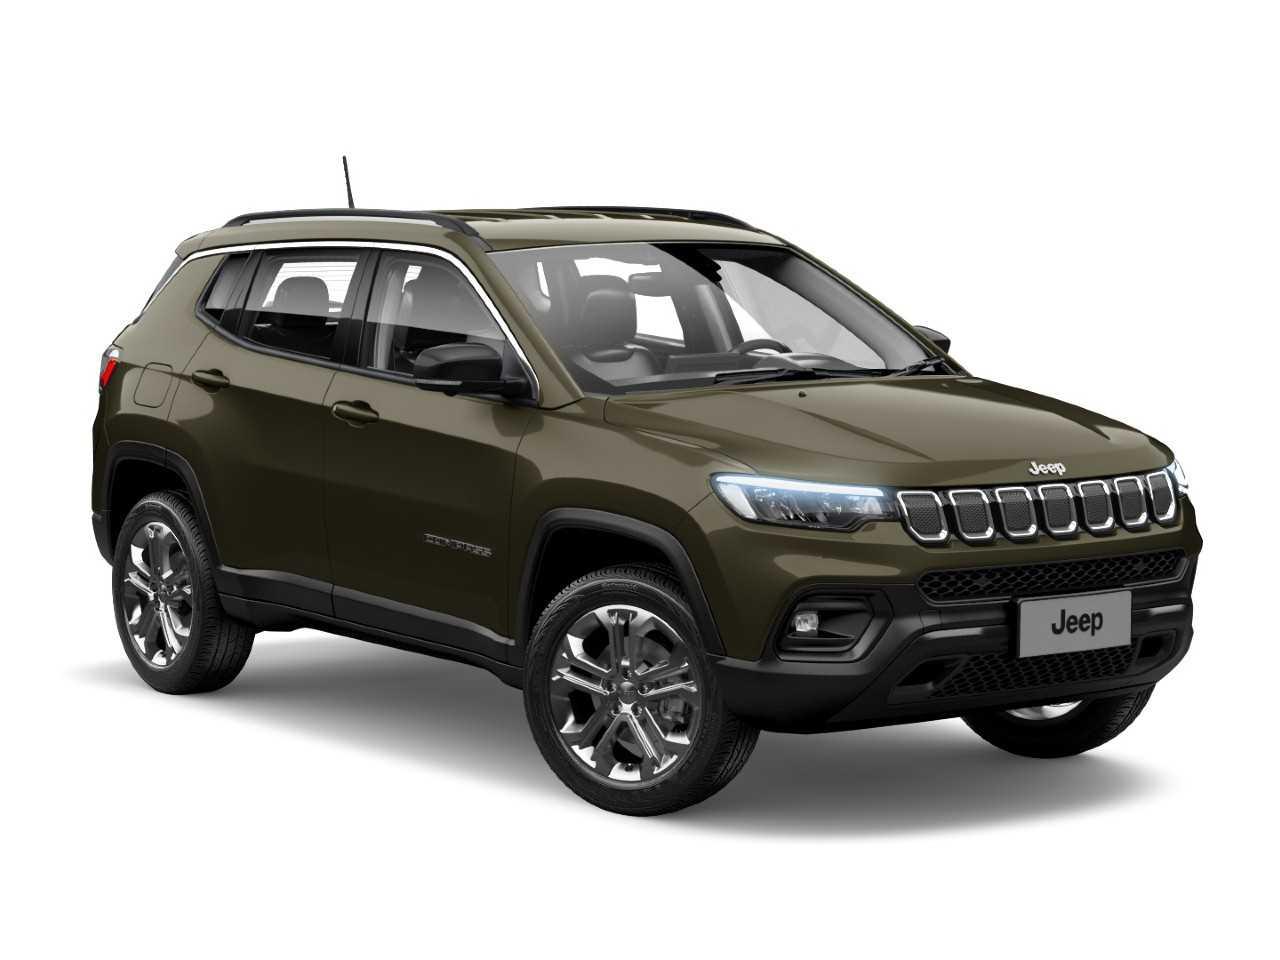 JeepCompass 2022 - ângulo frontal